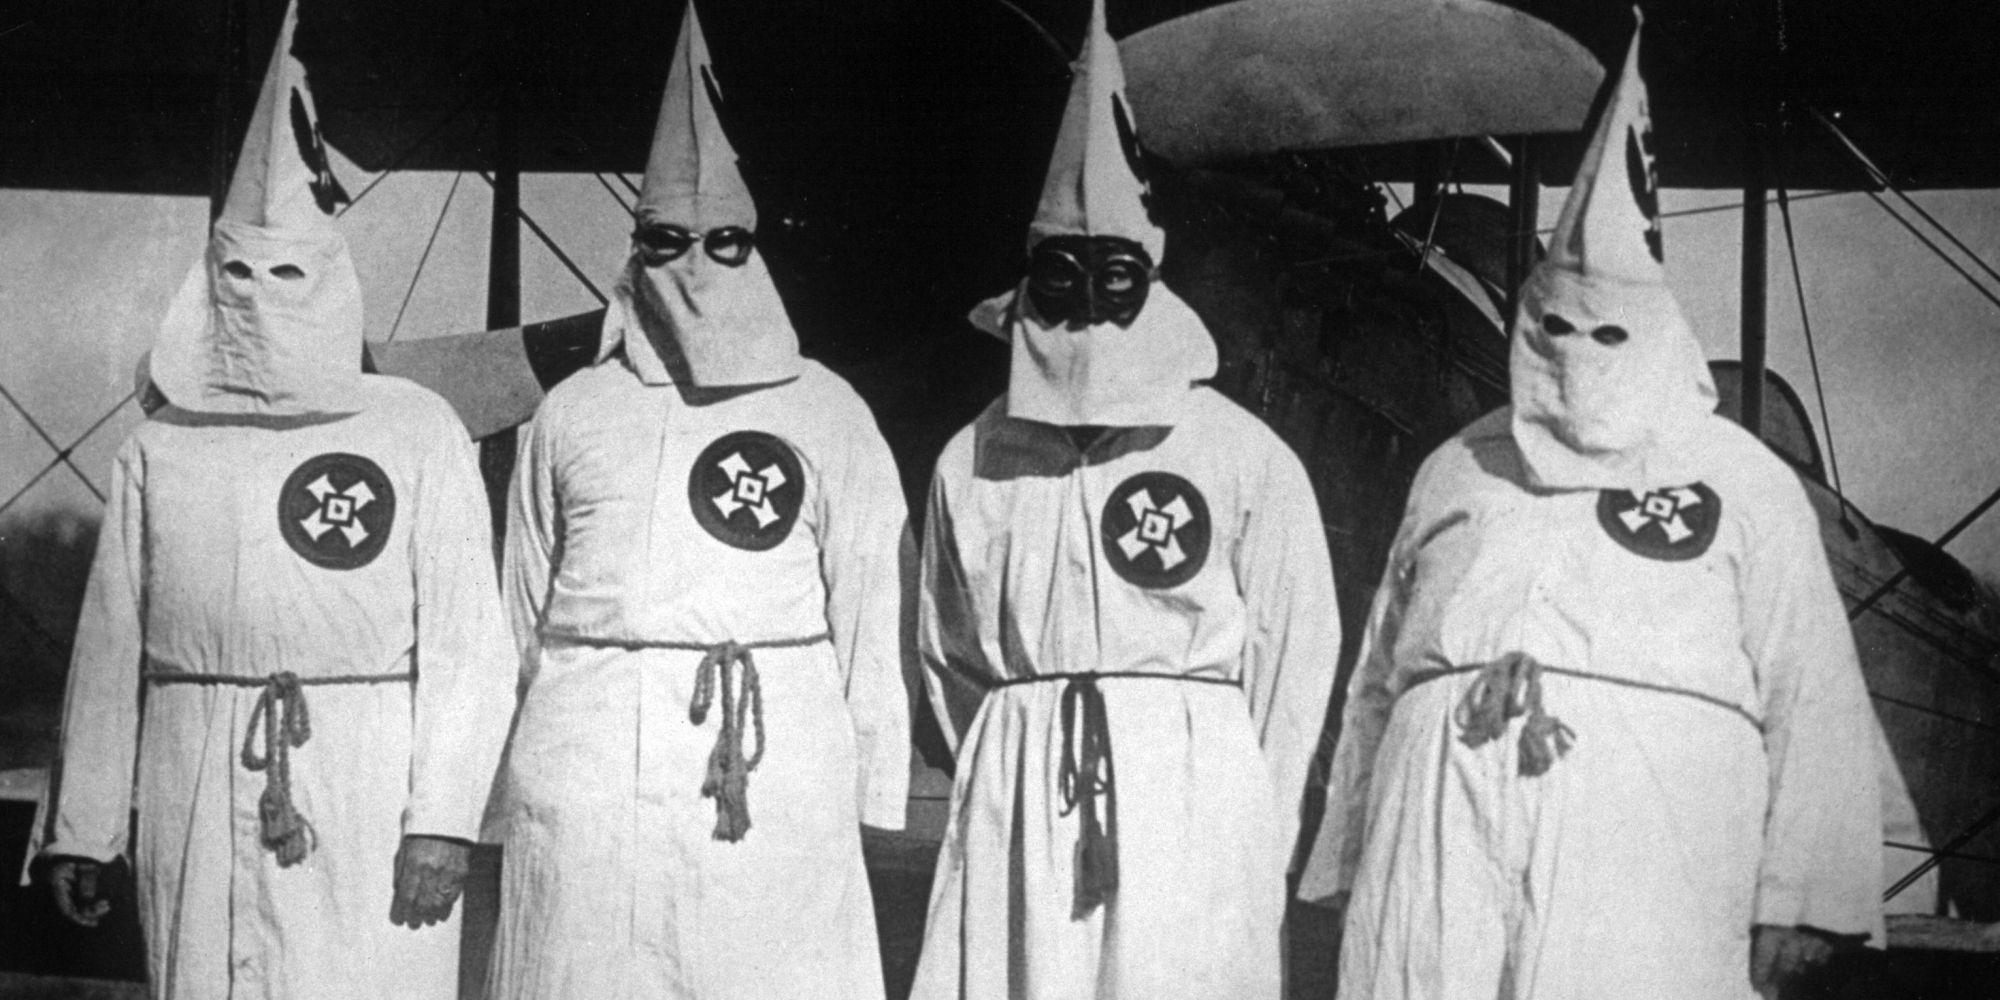 Ku Klux Klan Fliers Promoting Islamophobia Found In